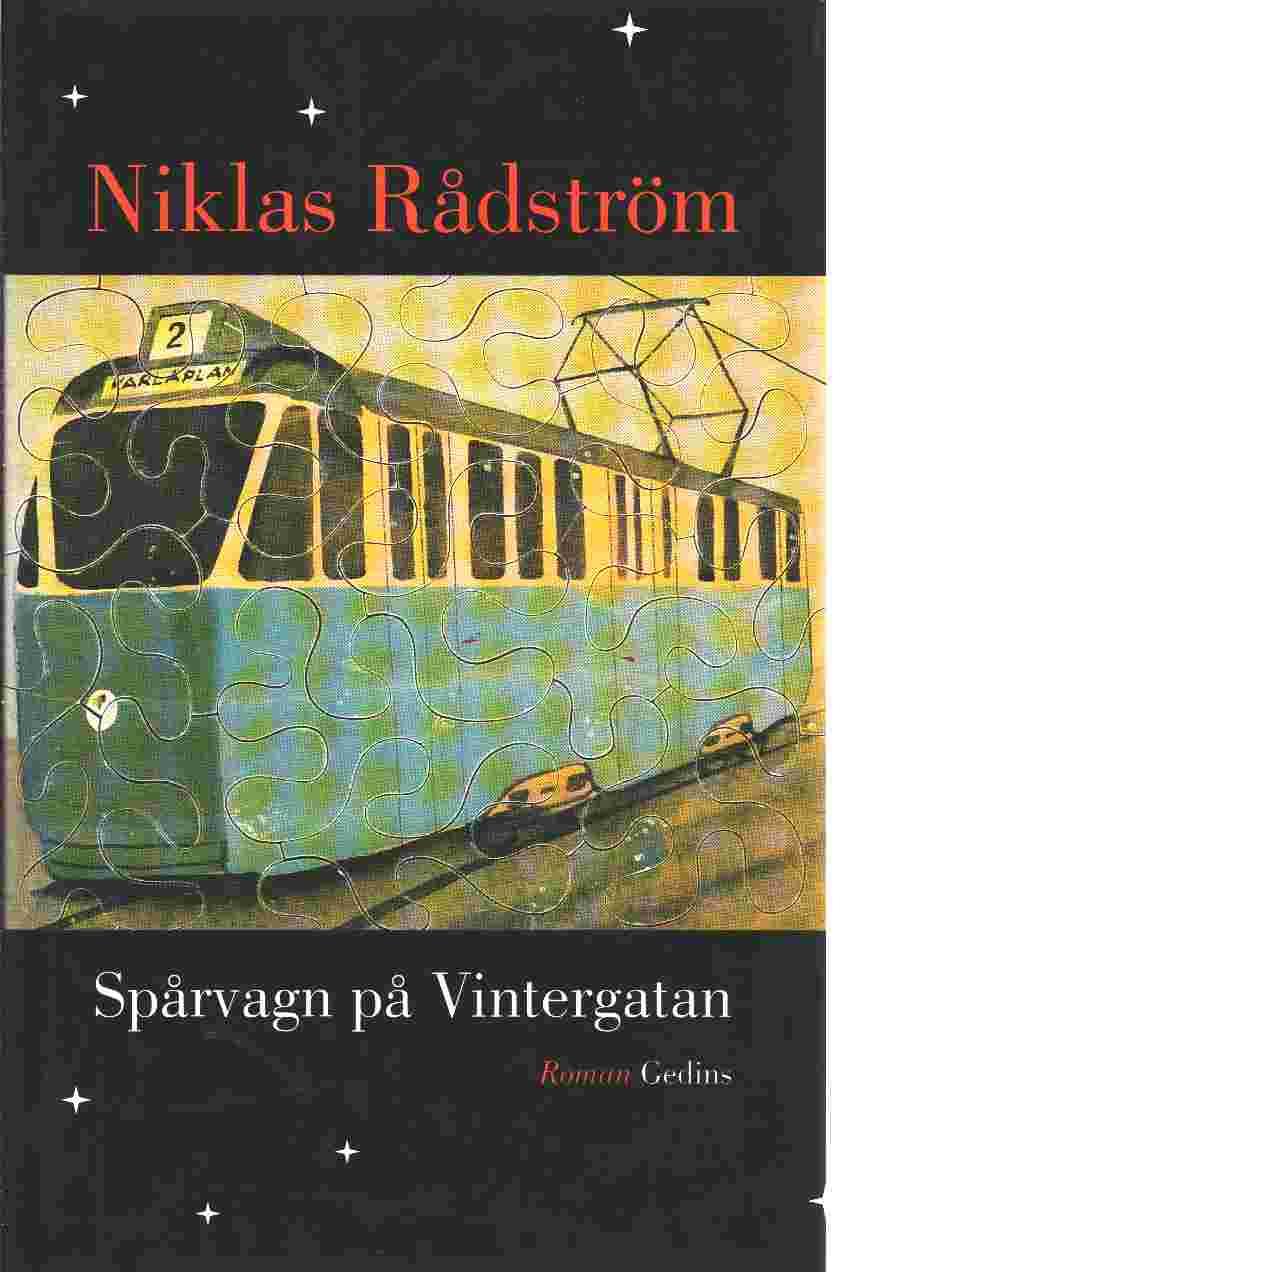 Spårvagn på Vintergatan - Rådström, Niklas